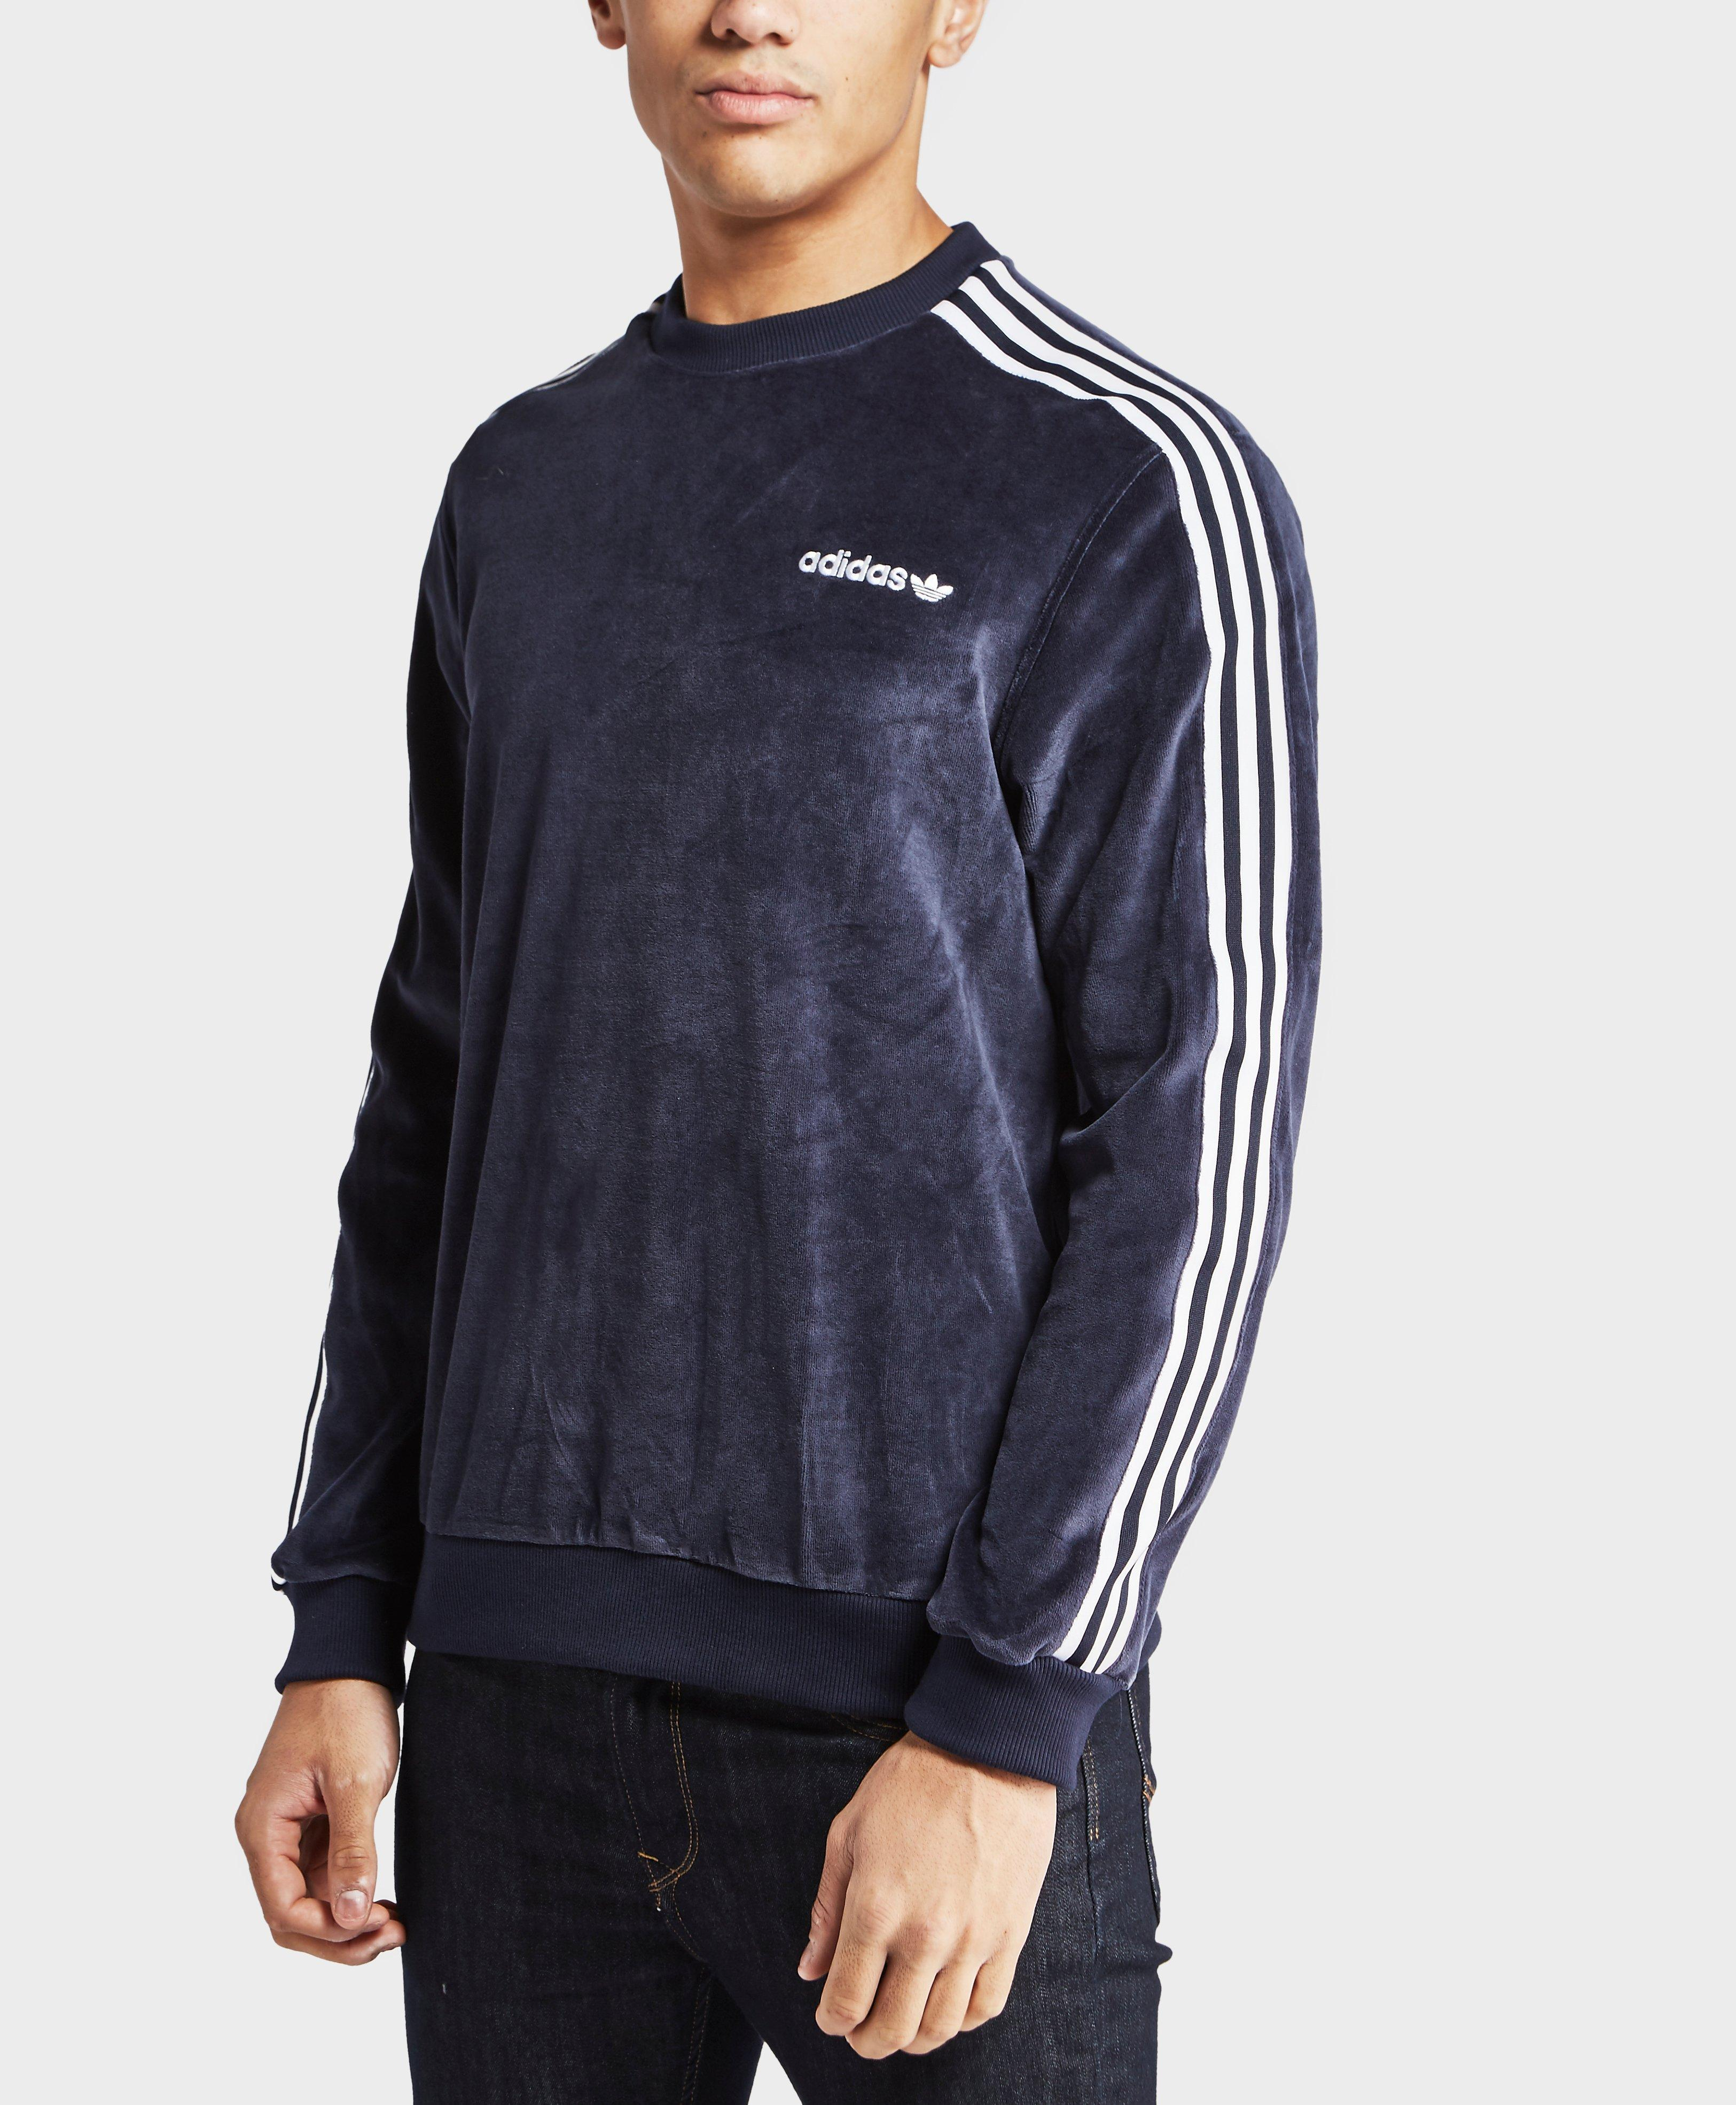 adidas originals velour crew sweatshirt in blue for men lyst. Black Bedroom Furniture Sets. Home Design Ideas